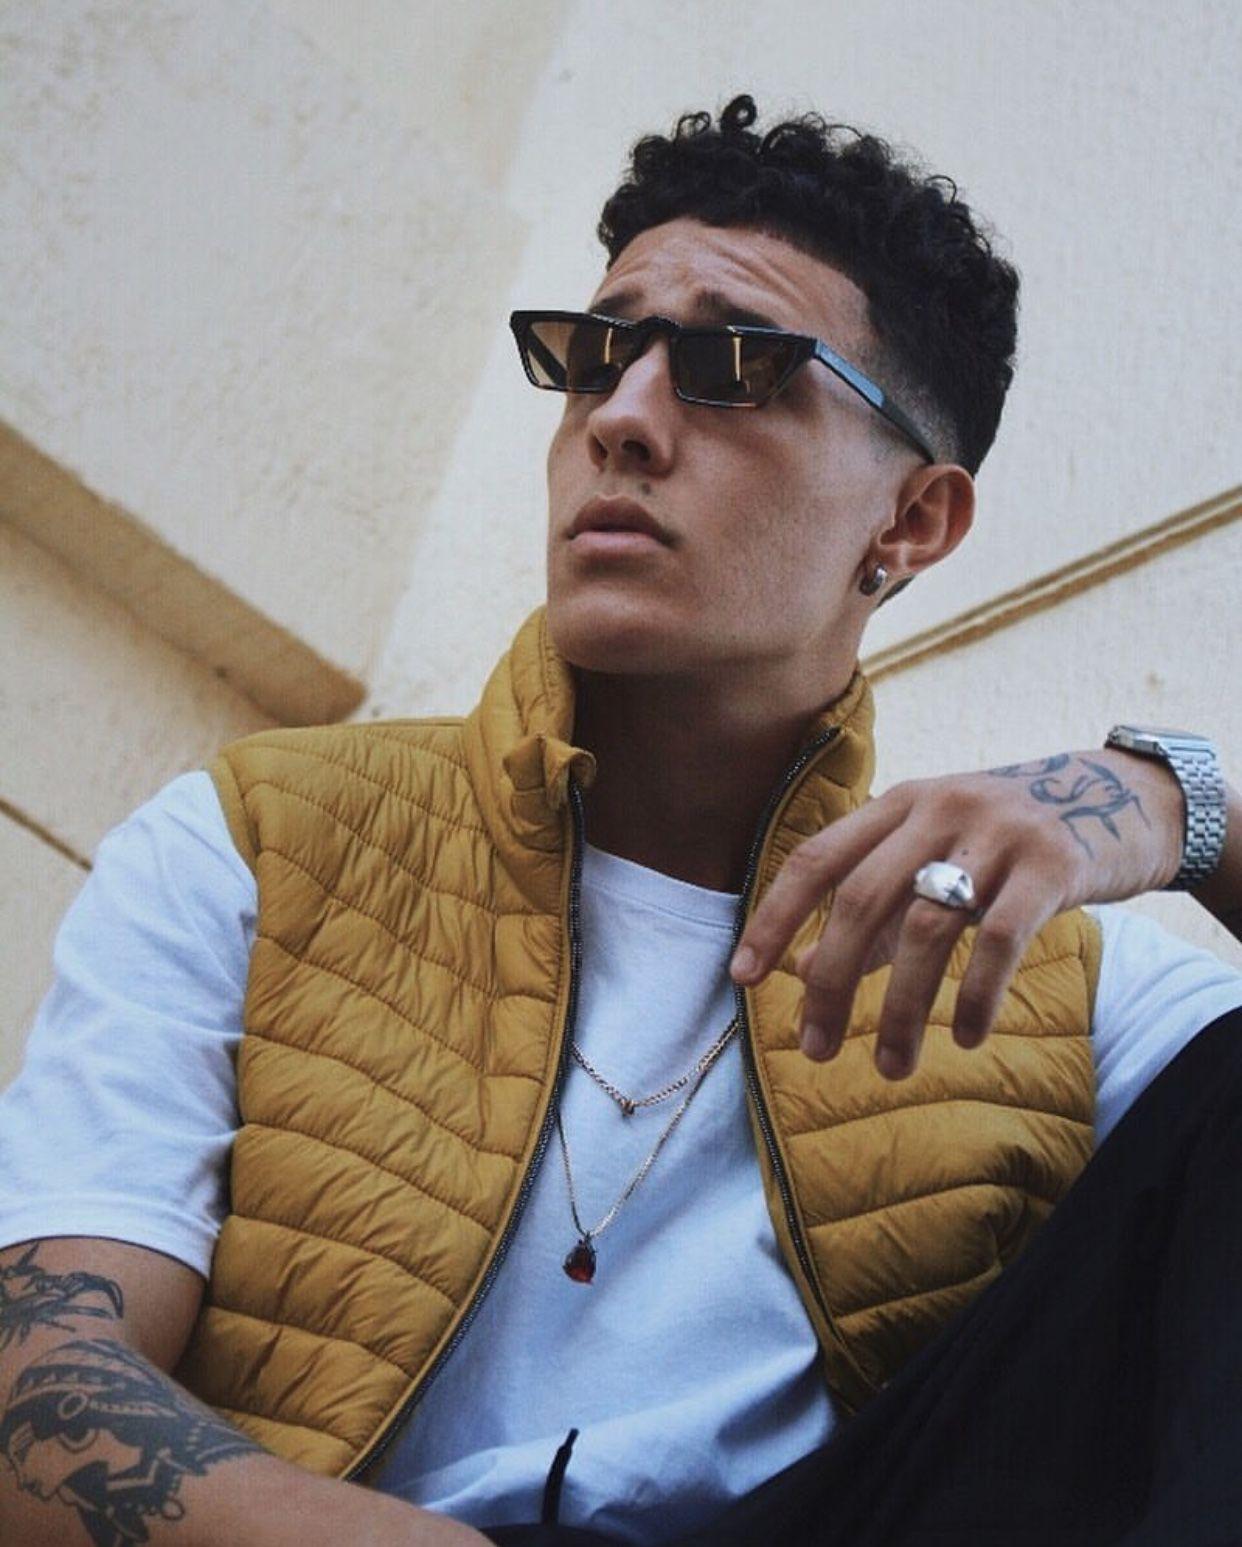 d4a4b0ced3368 Blog It Boy - Blog de Moda Masculina  ÓCULOS DE SOL MASCULINO para 2018